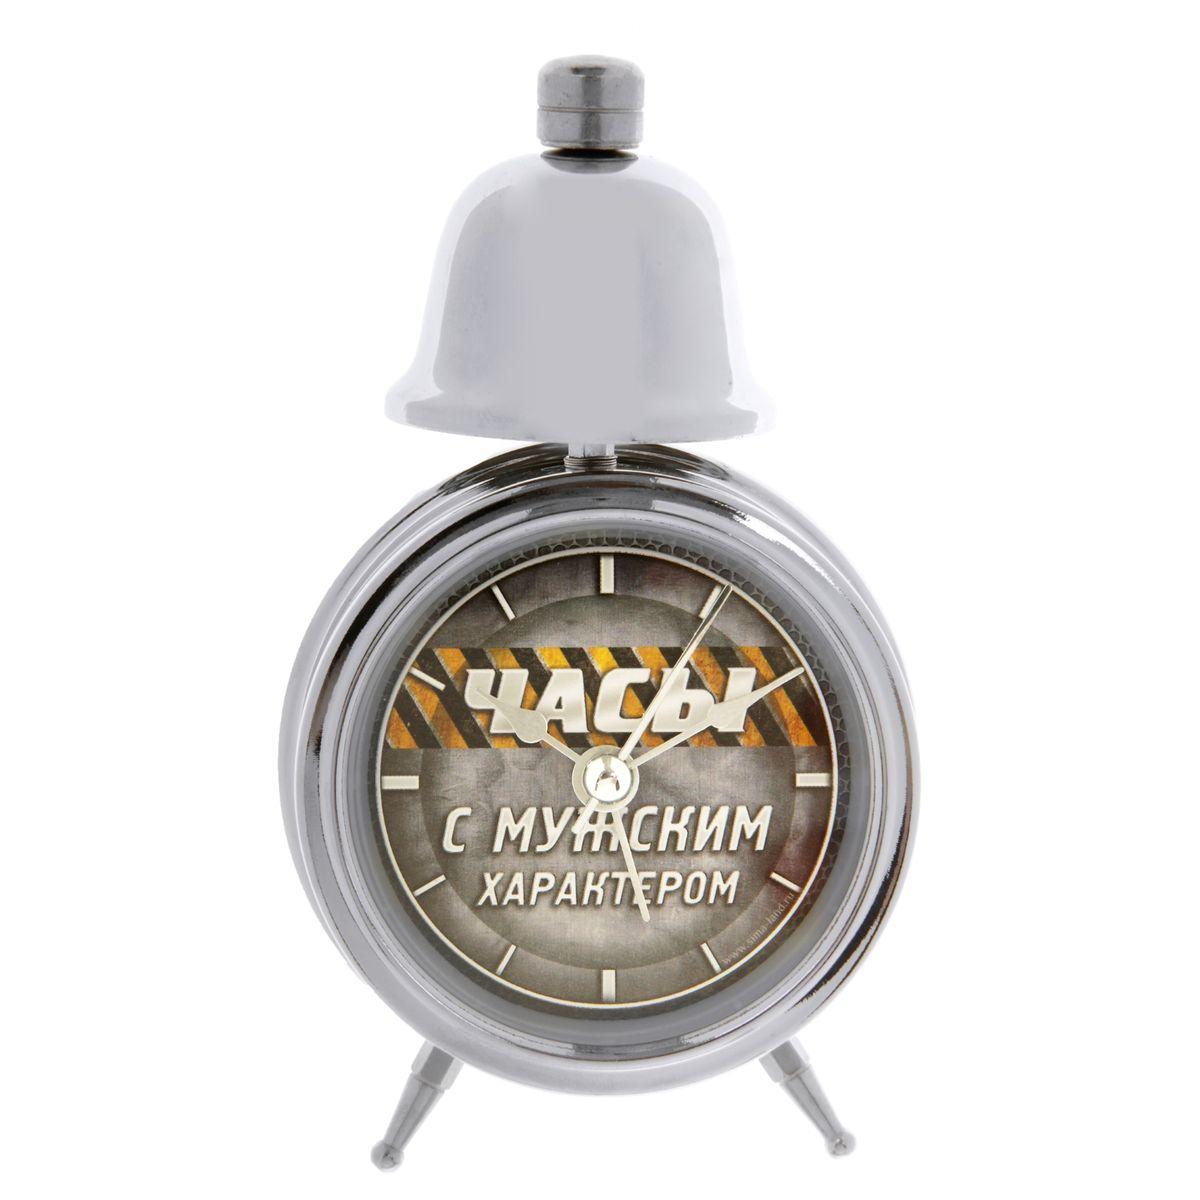 Часы-будильник Sima-land Часы с мужским характером часы будильник sima land жду встречи